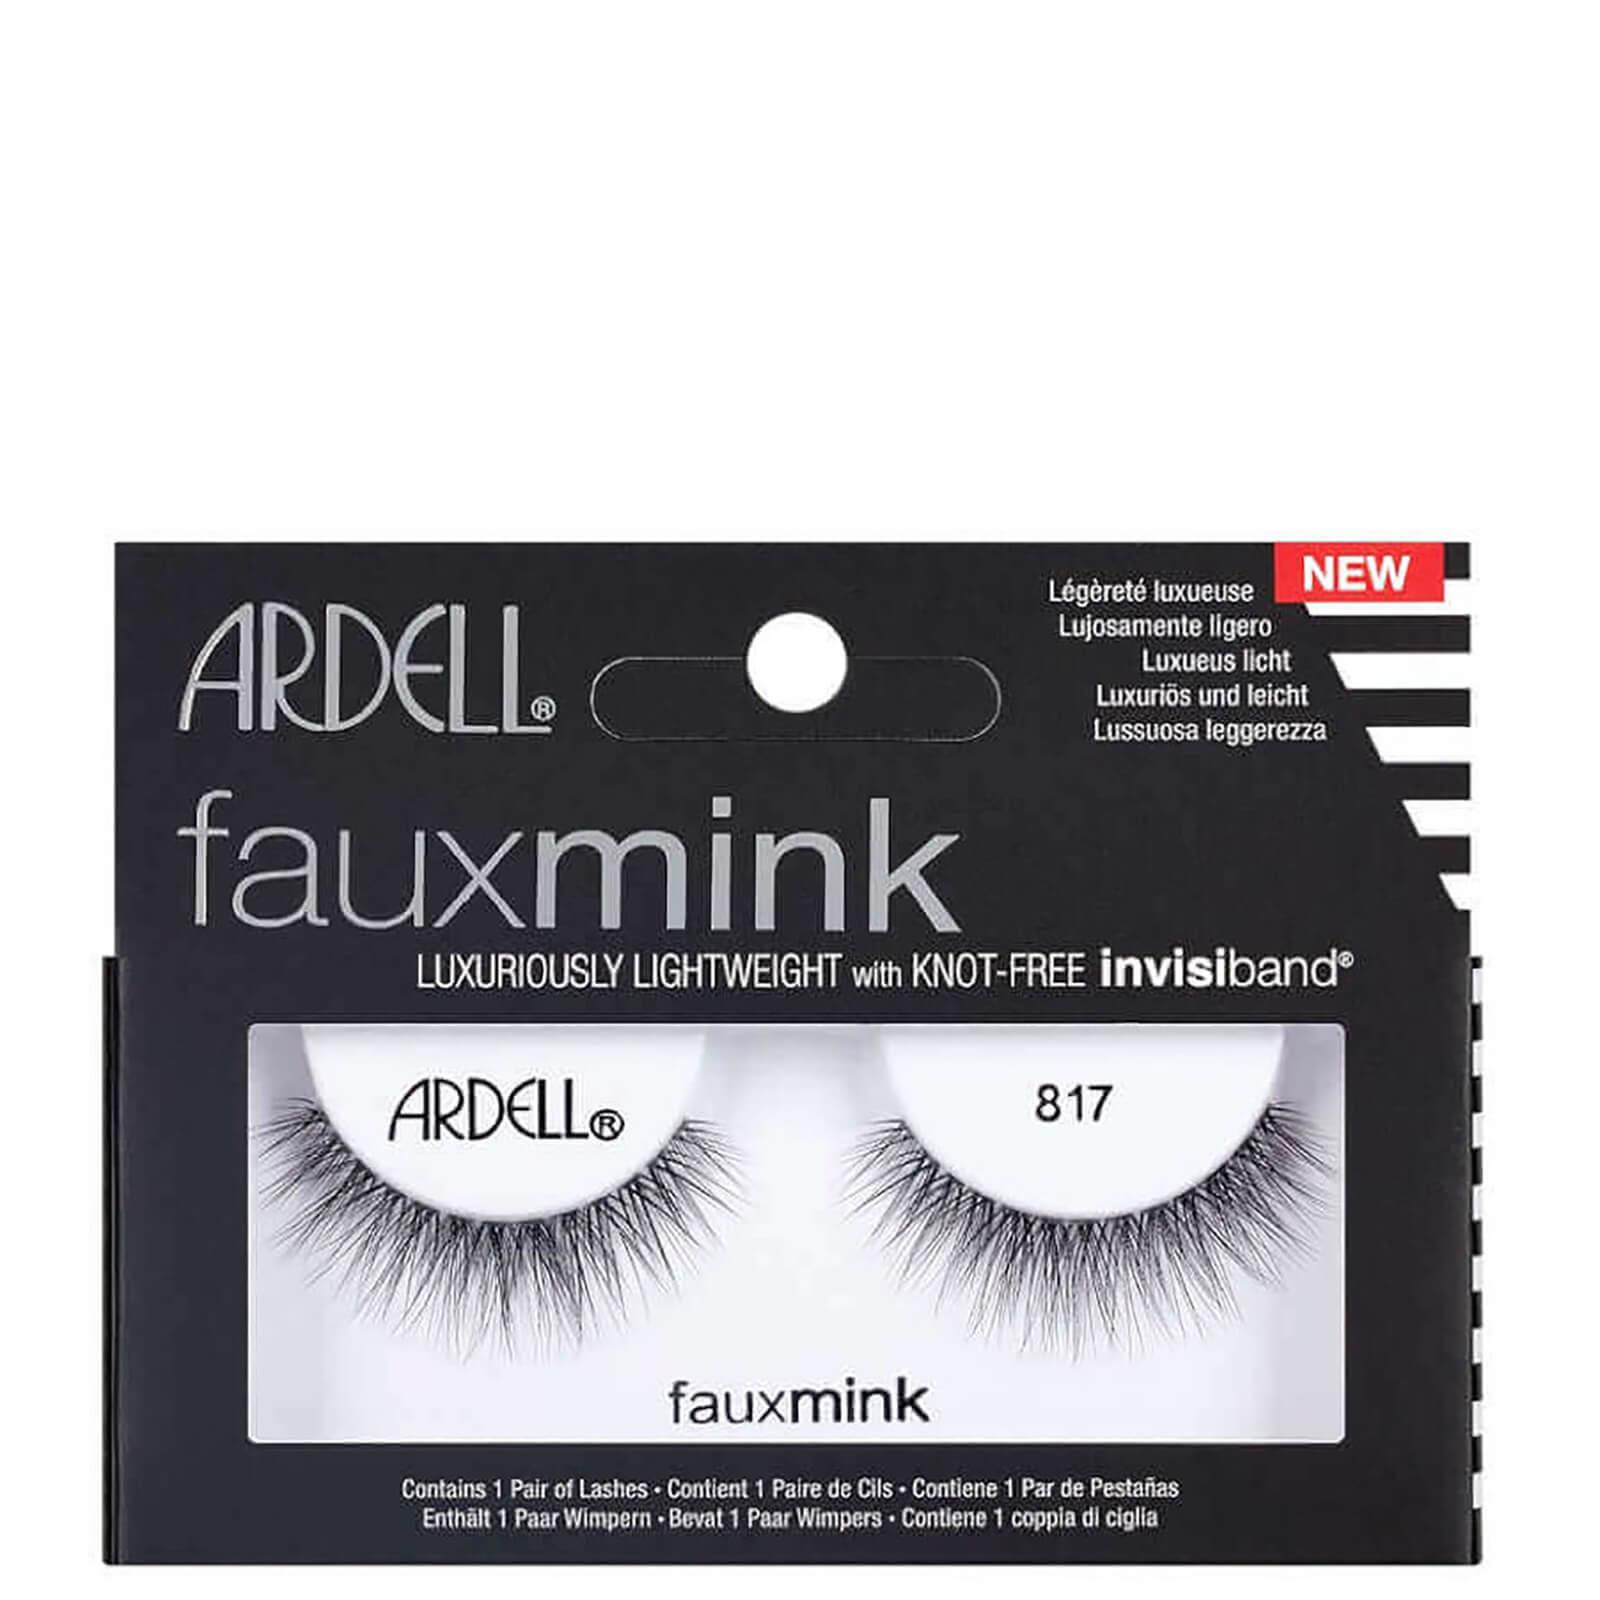 Купить Ardell Faux Mink 817